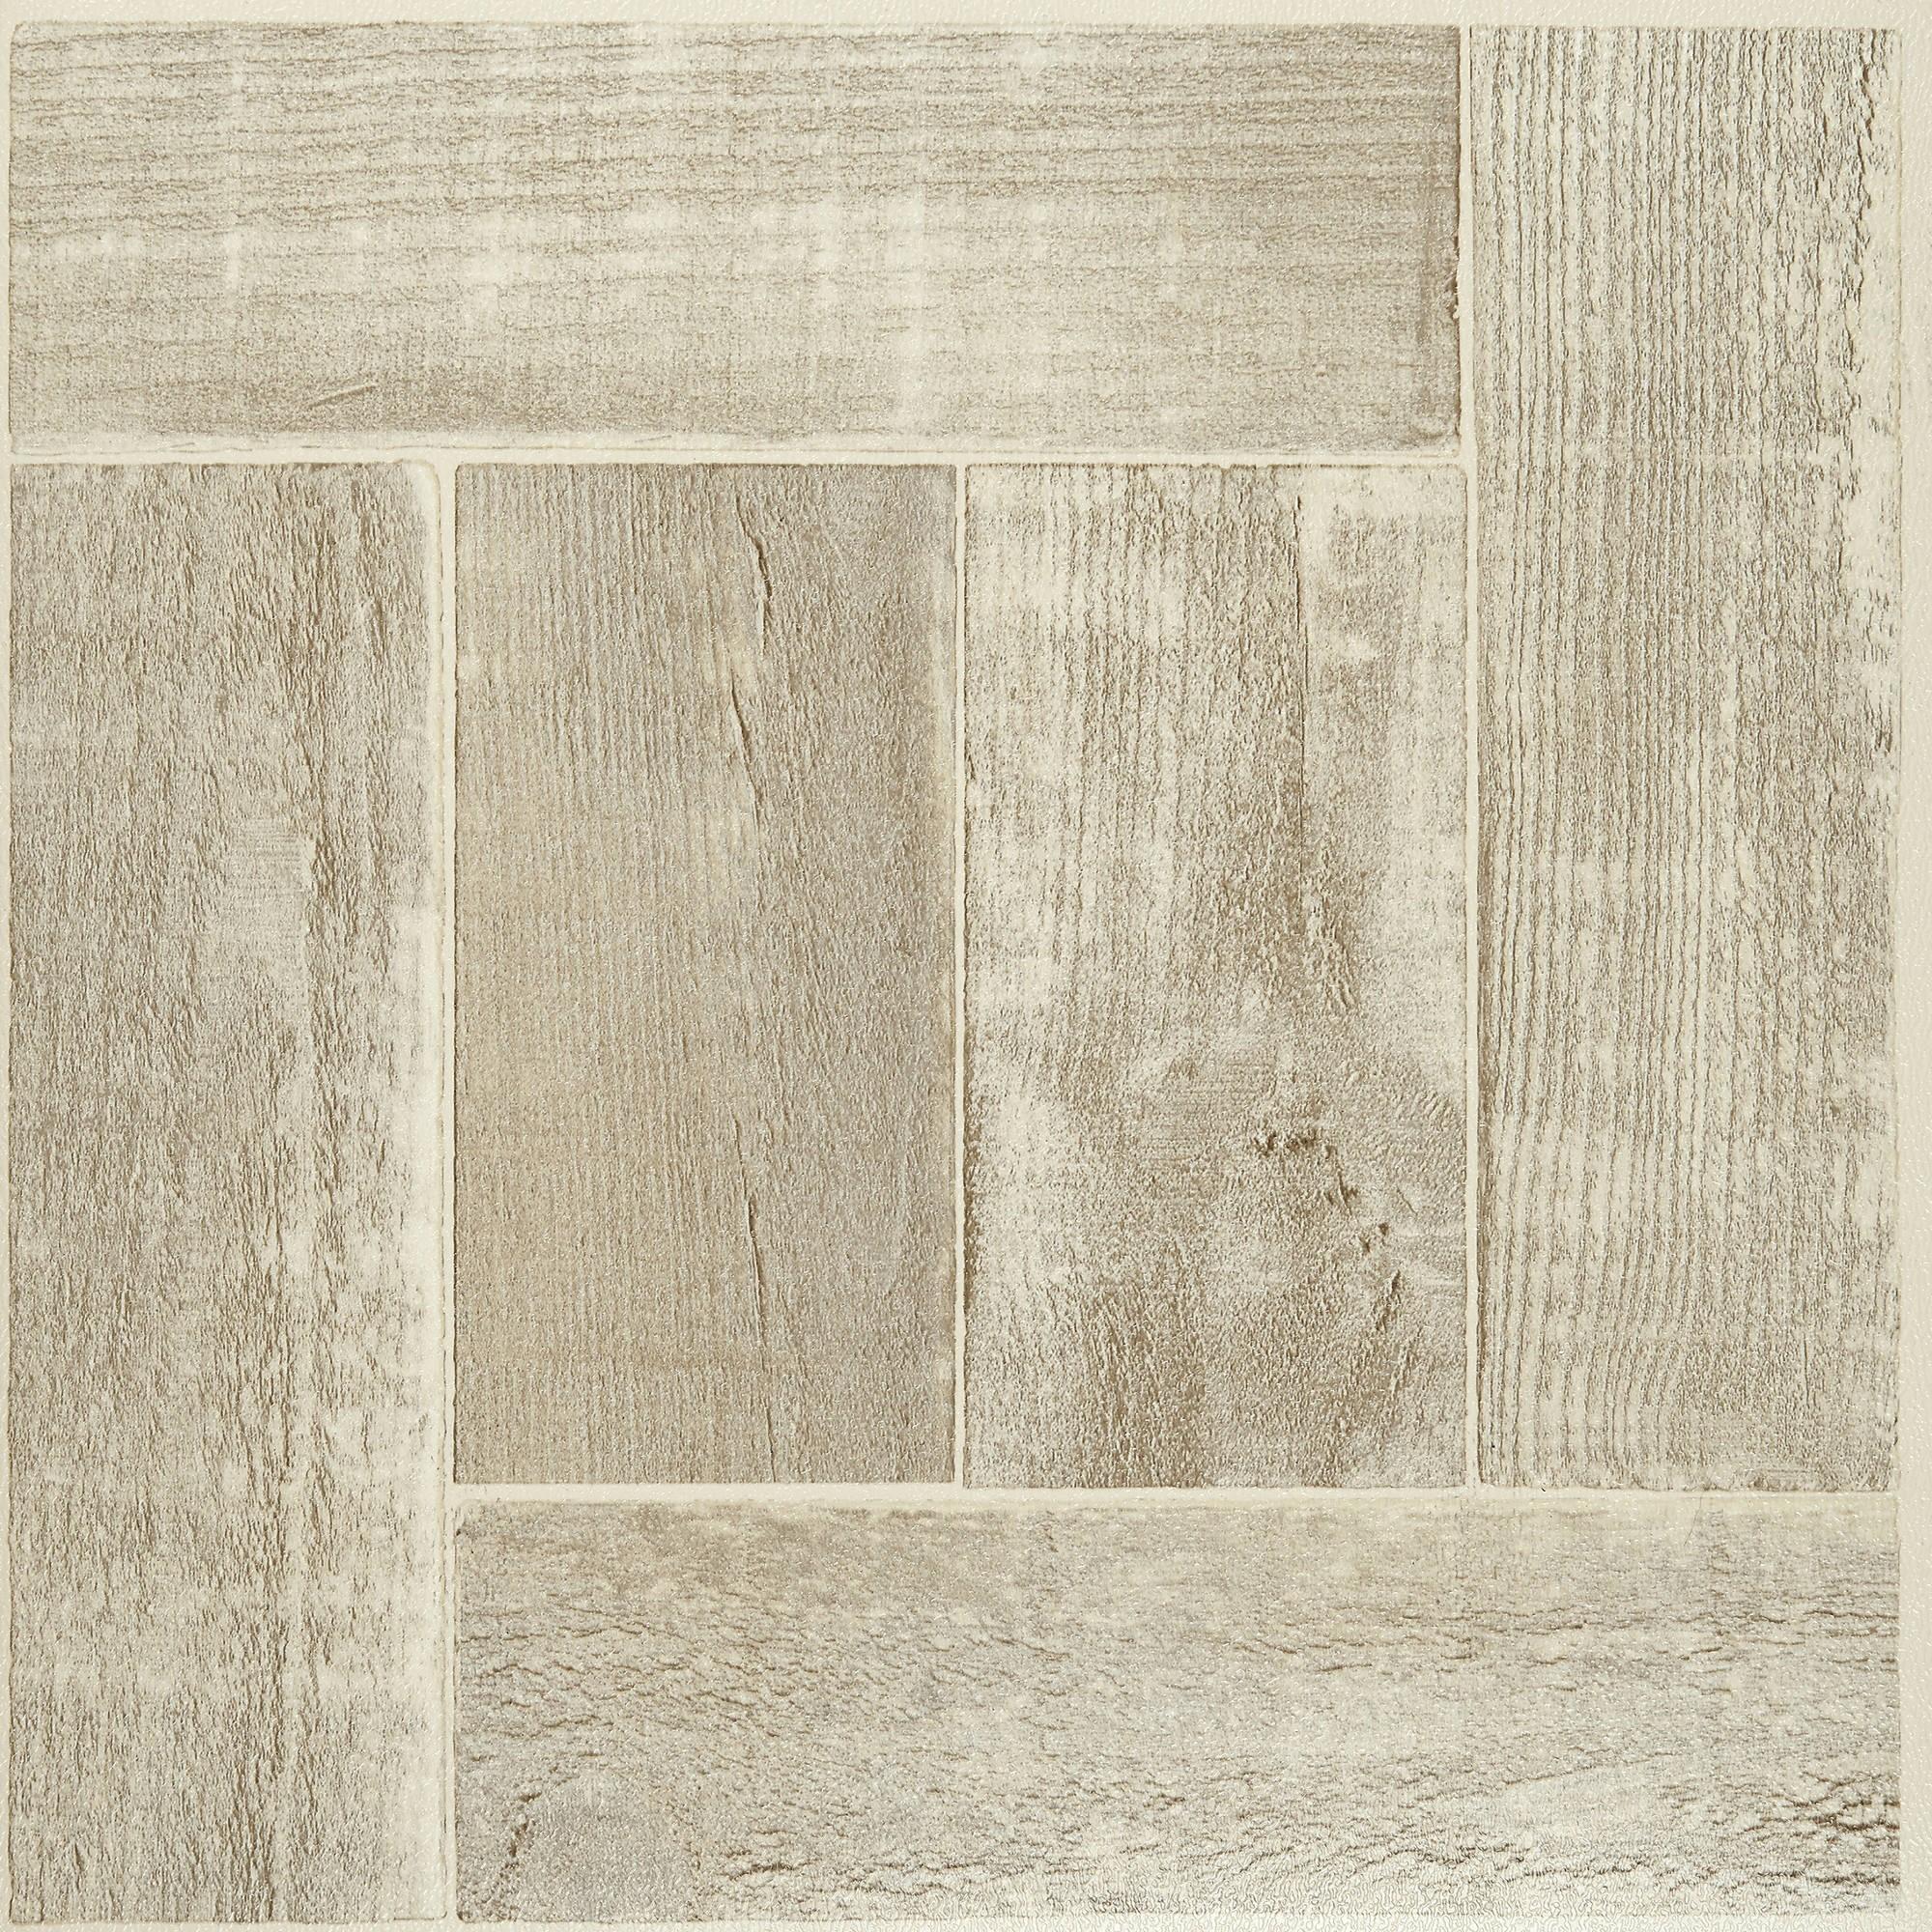 vinyl floor tiles nexus saddlewood 12x12 self adhesive vinyl floor tile - 20 tiles/20 sq. ft VGDCMJD